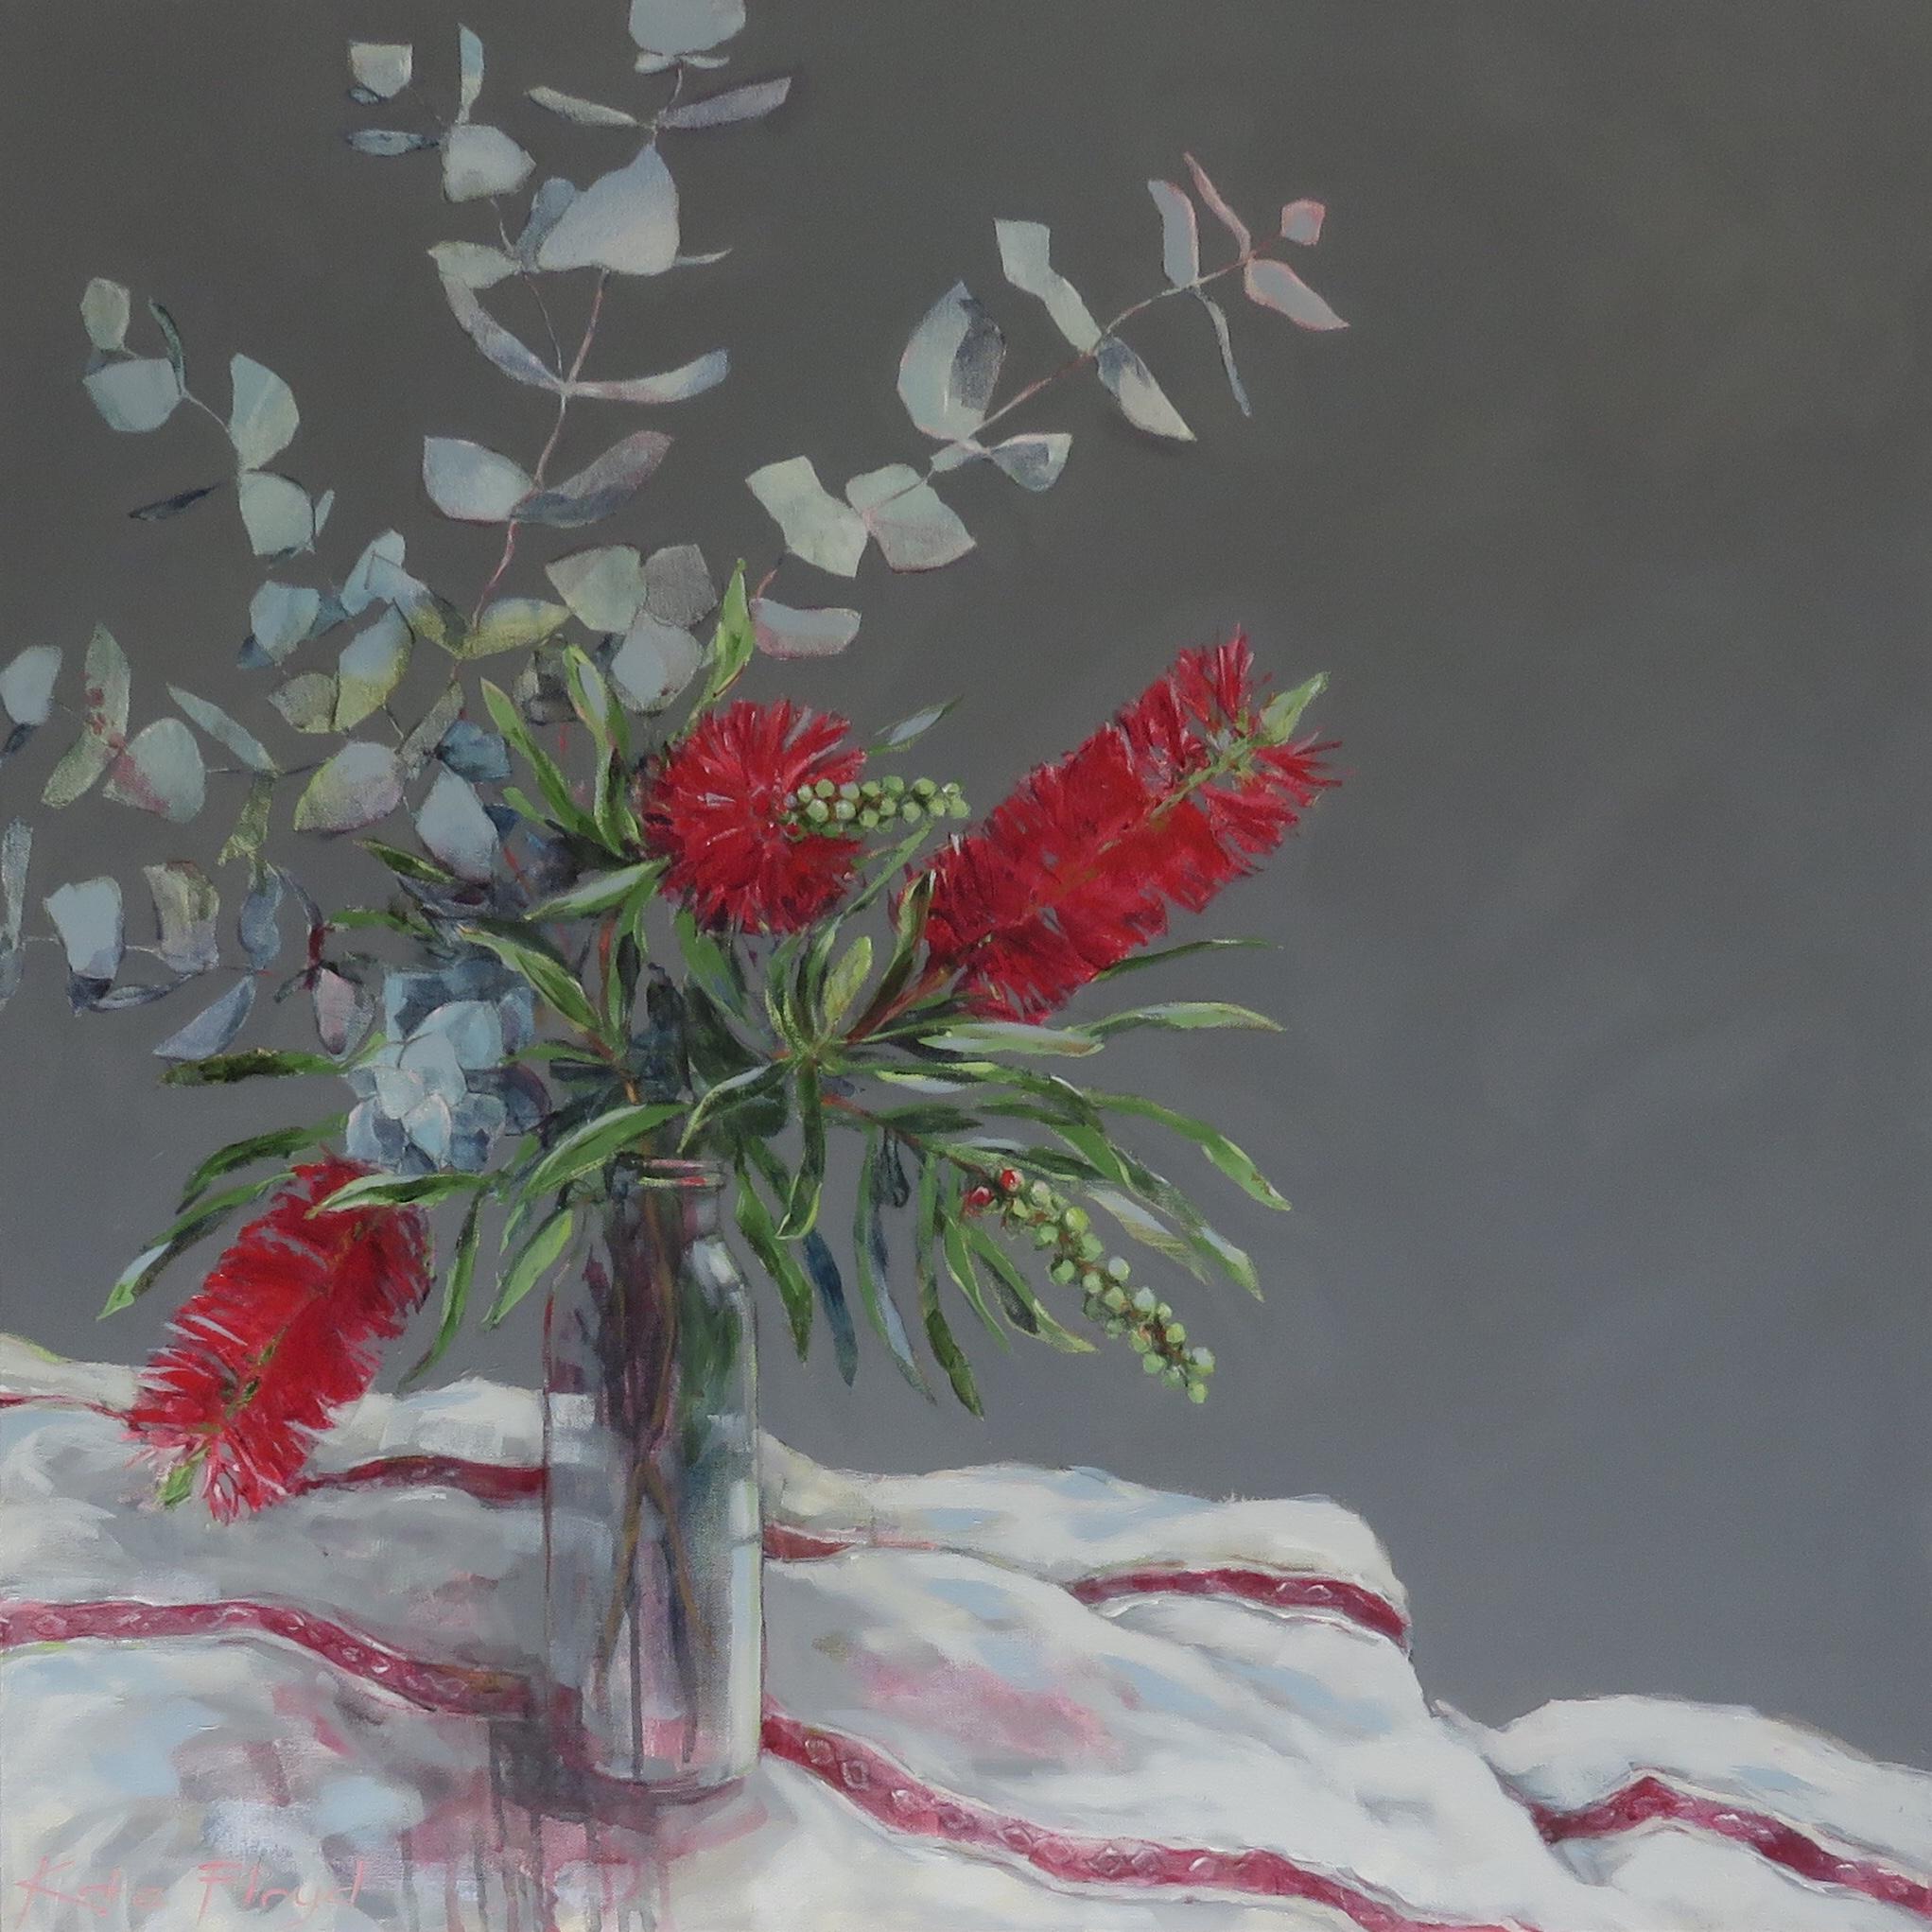 Crimson Bottlebrush 2018 Acrylic on canv